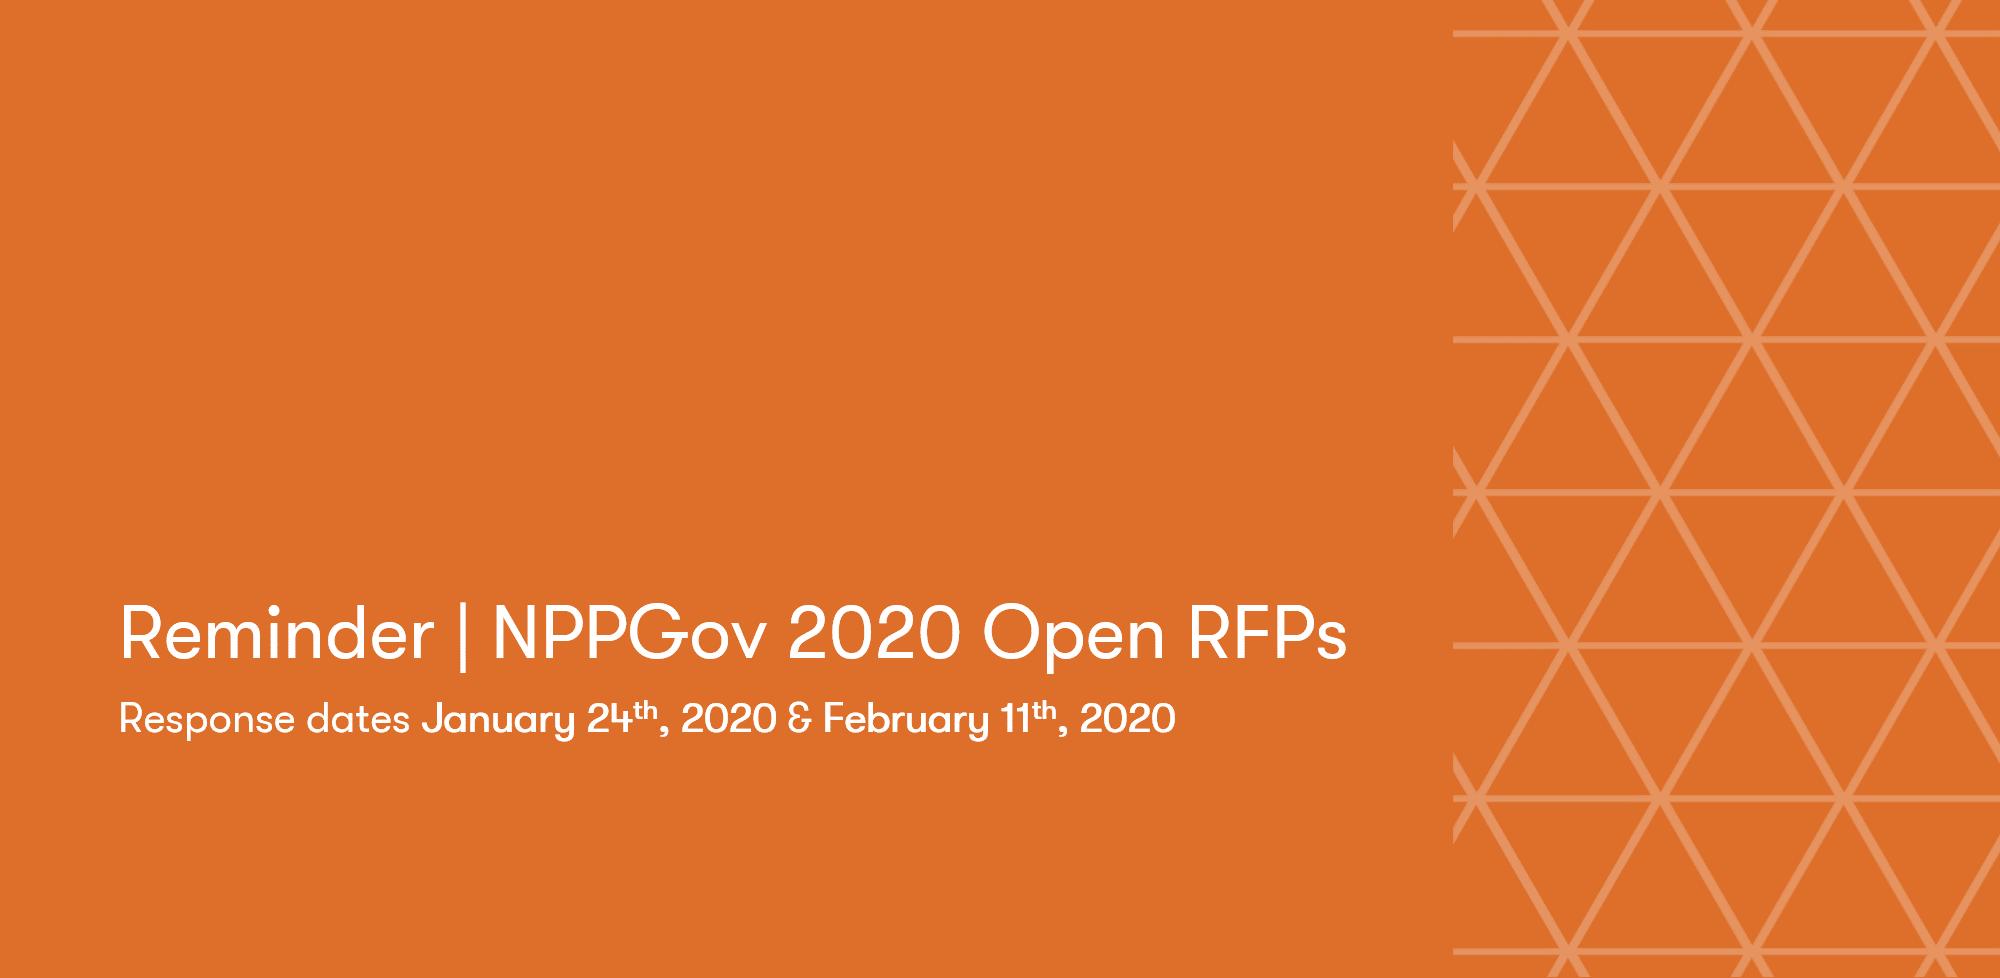 RFP Announcement